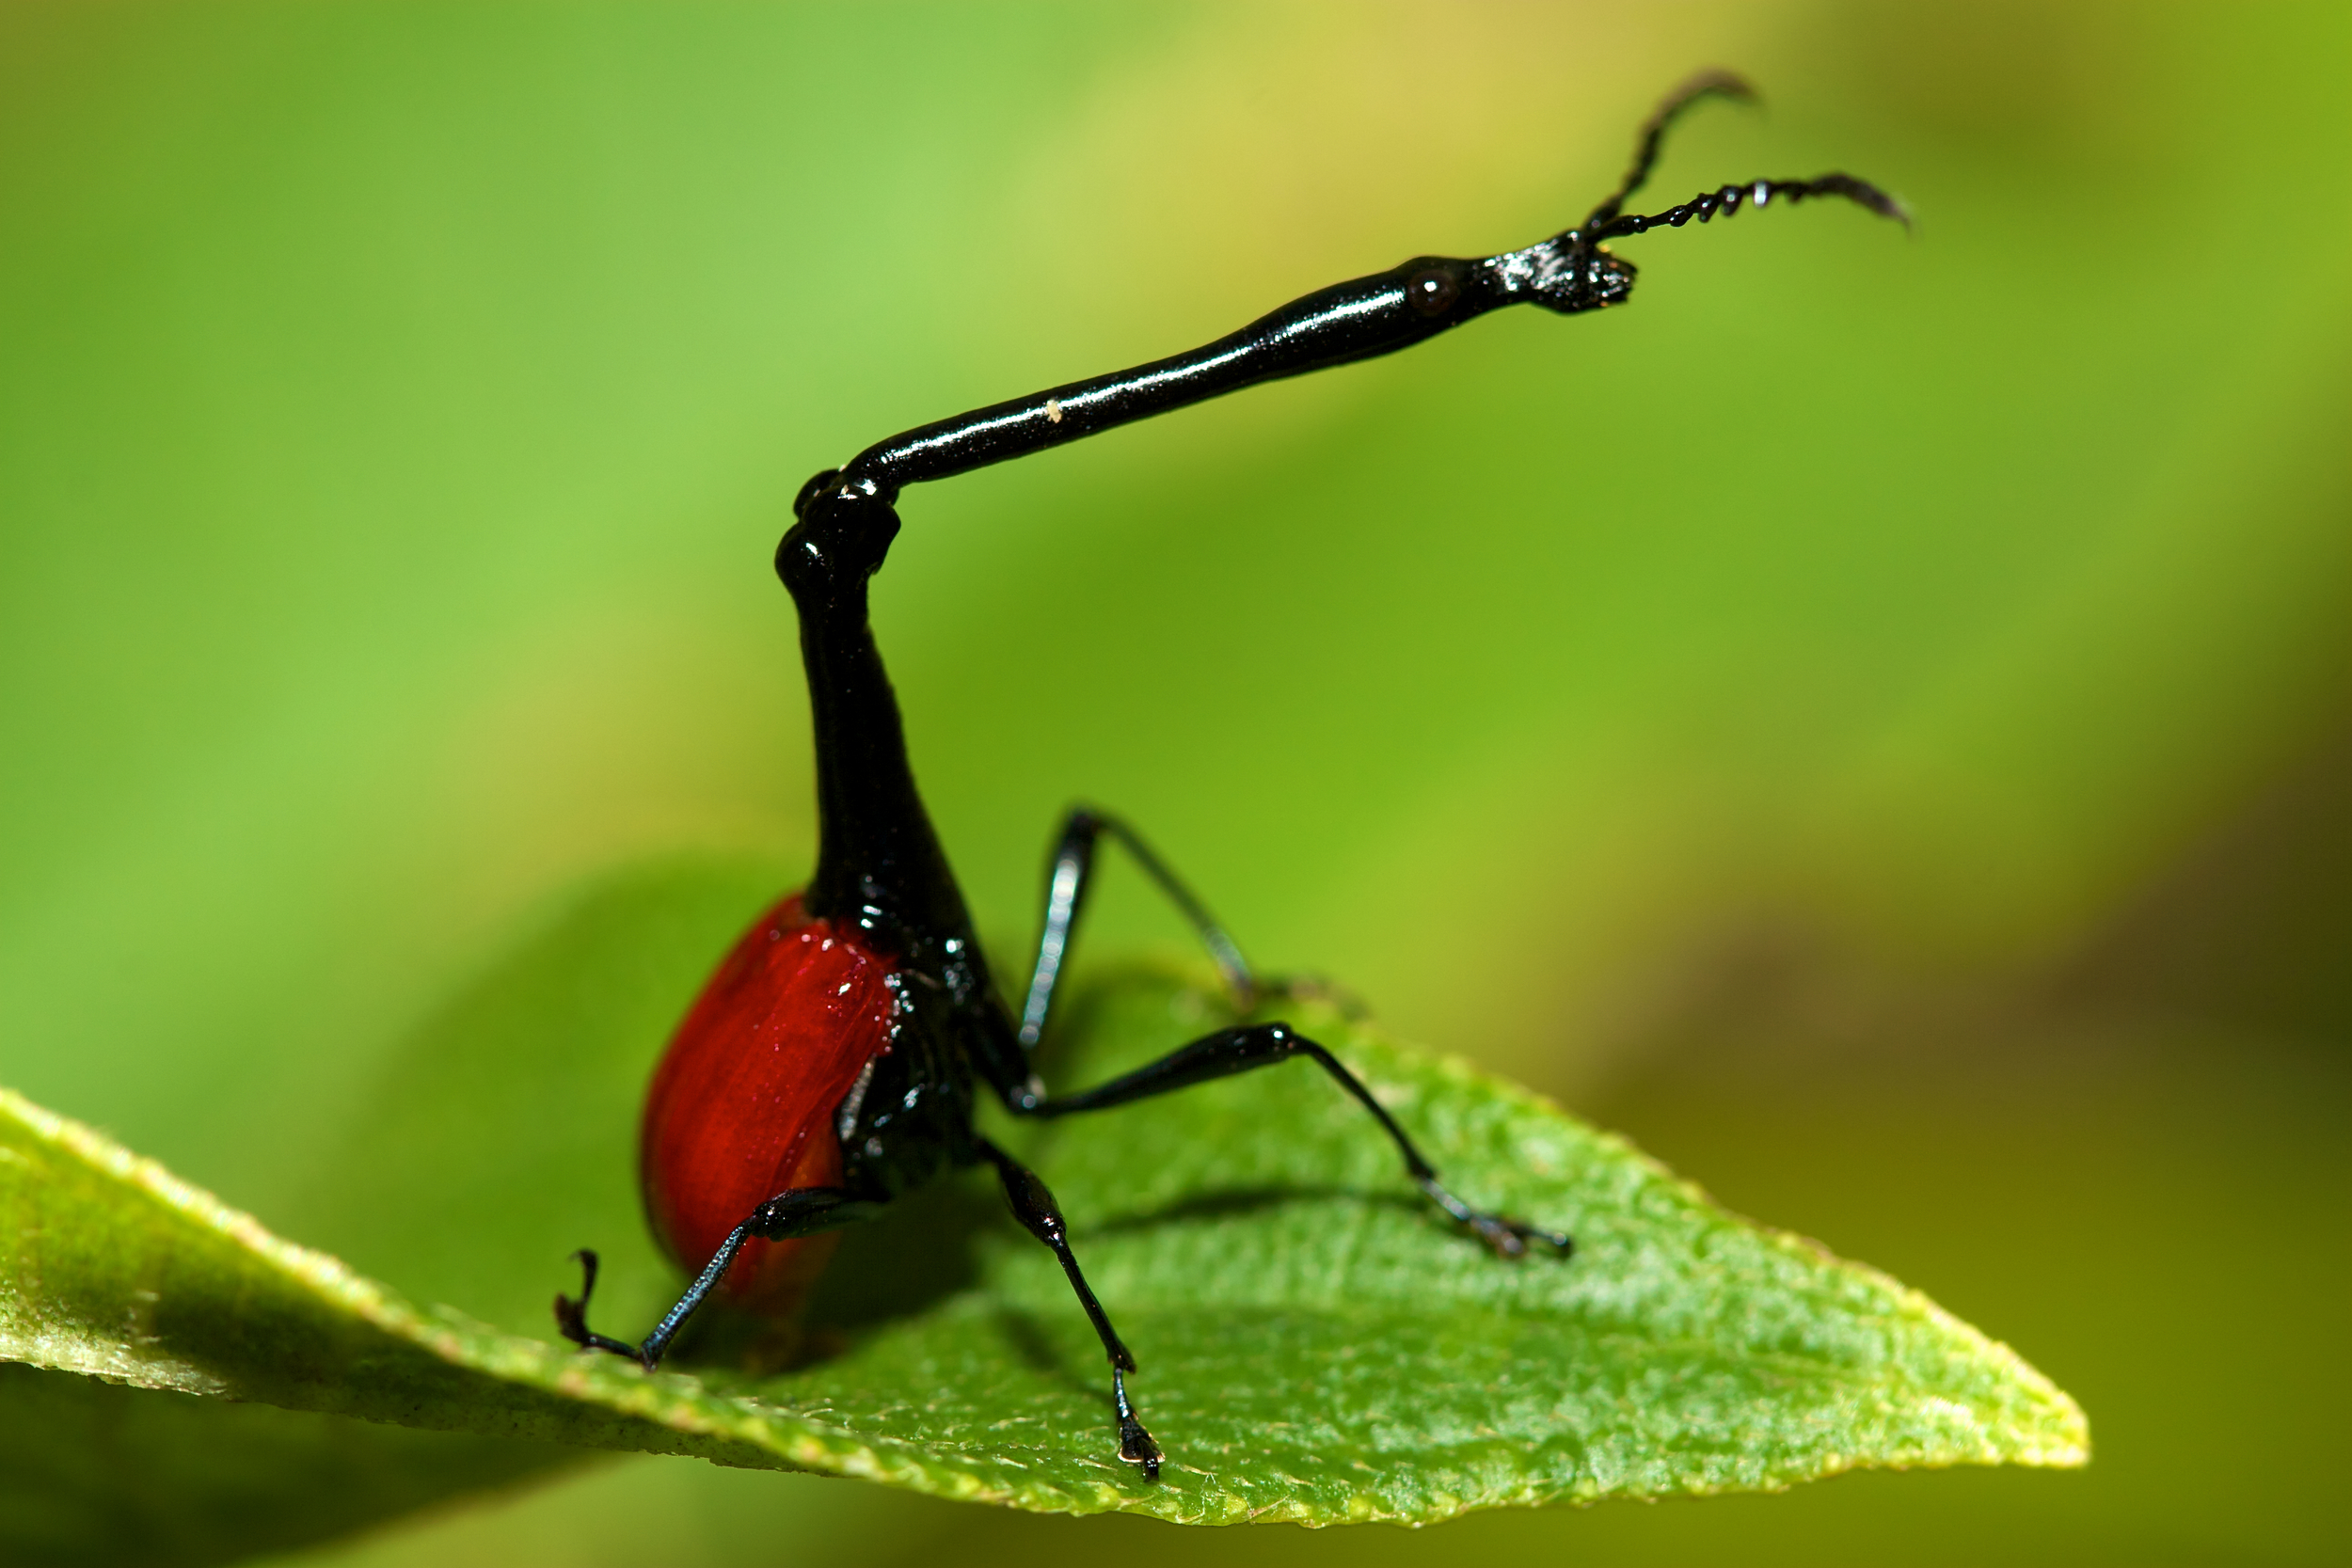 Giraffe necked weevil (beetle). Photo by Travis Steffens